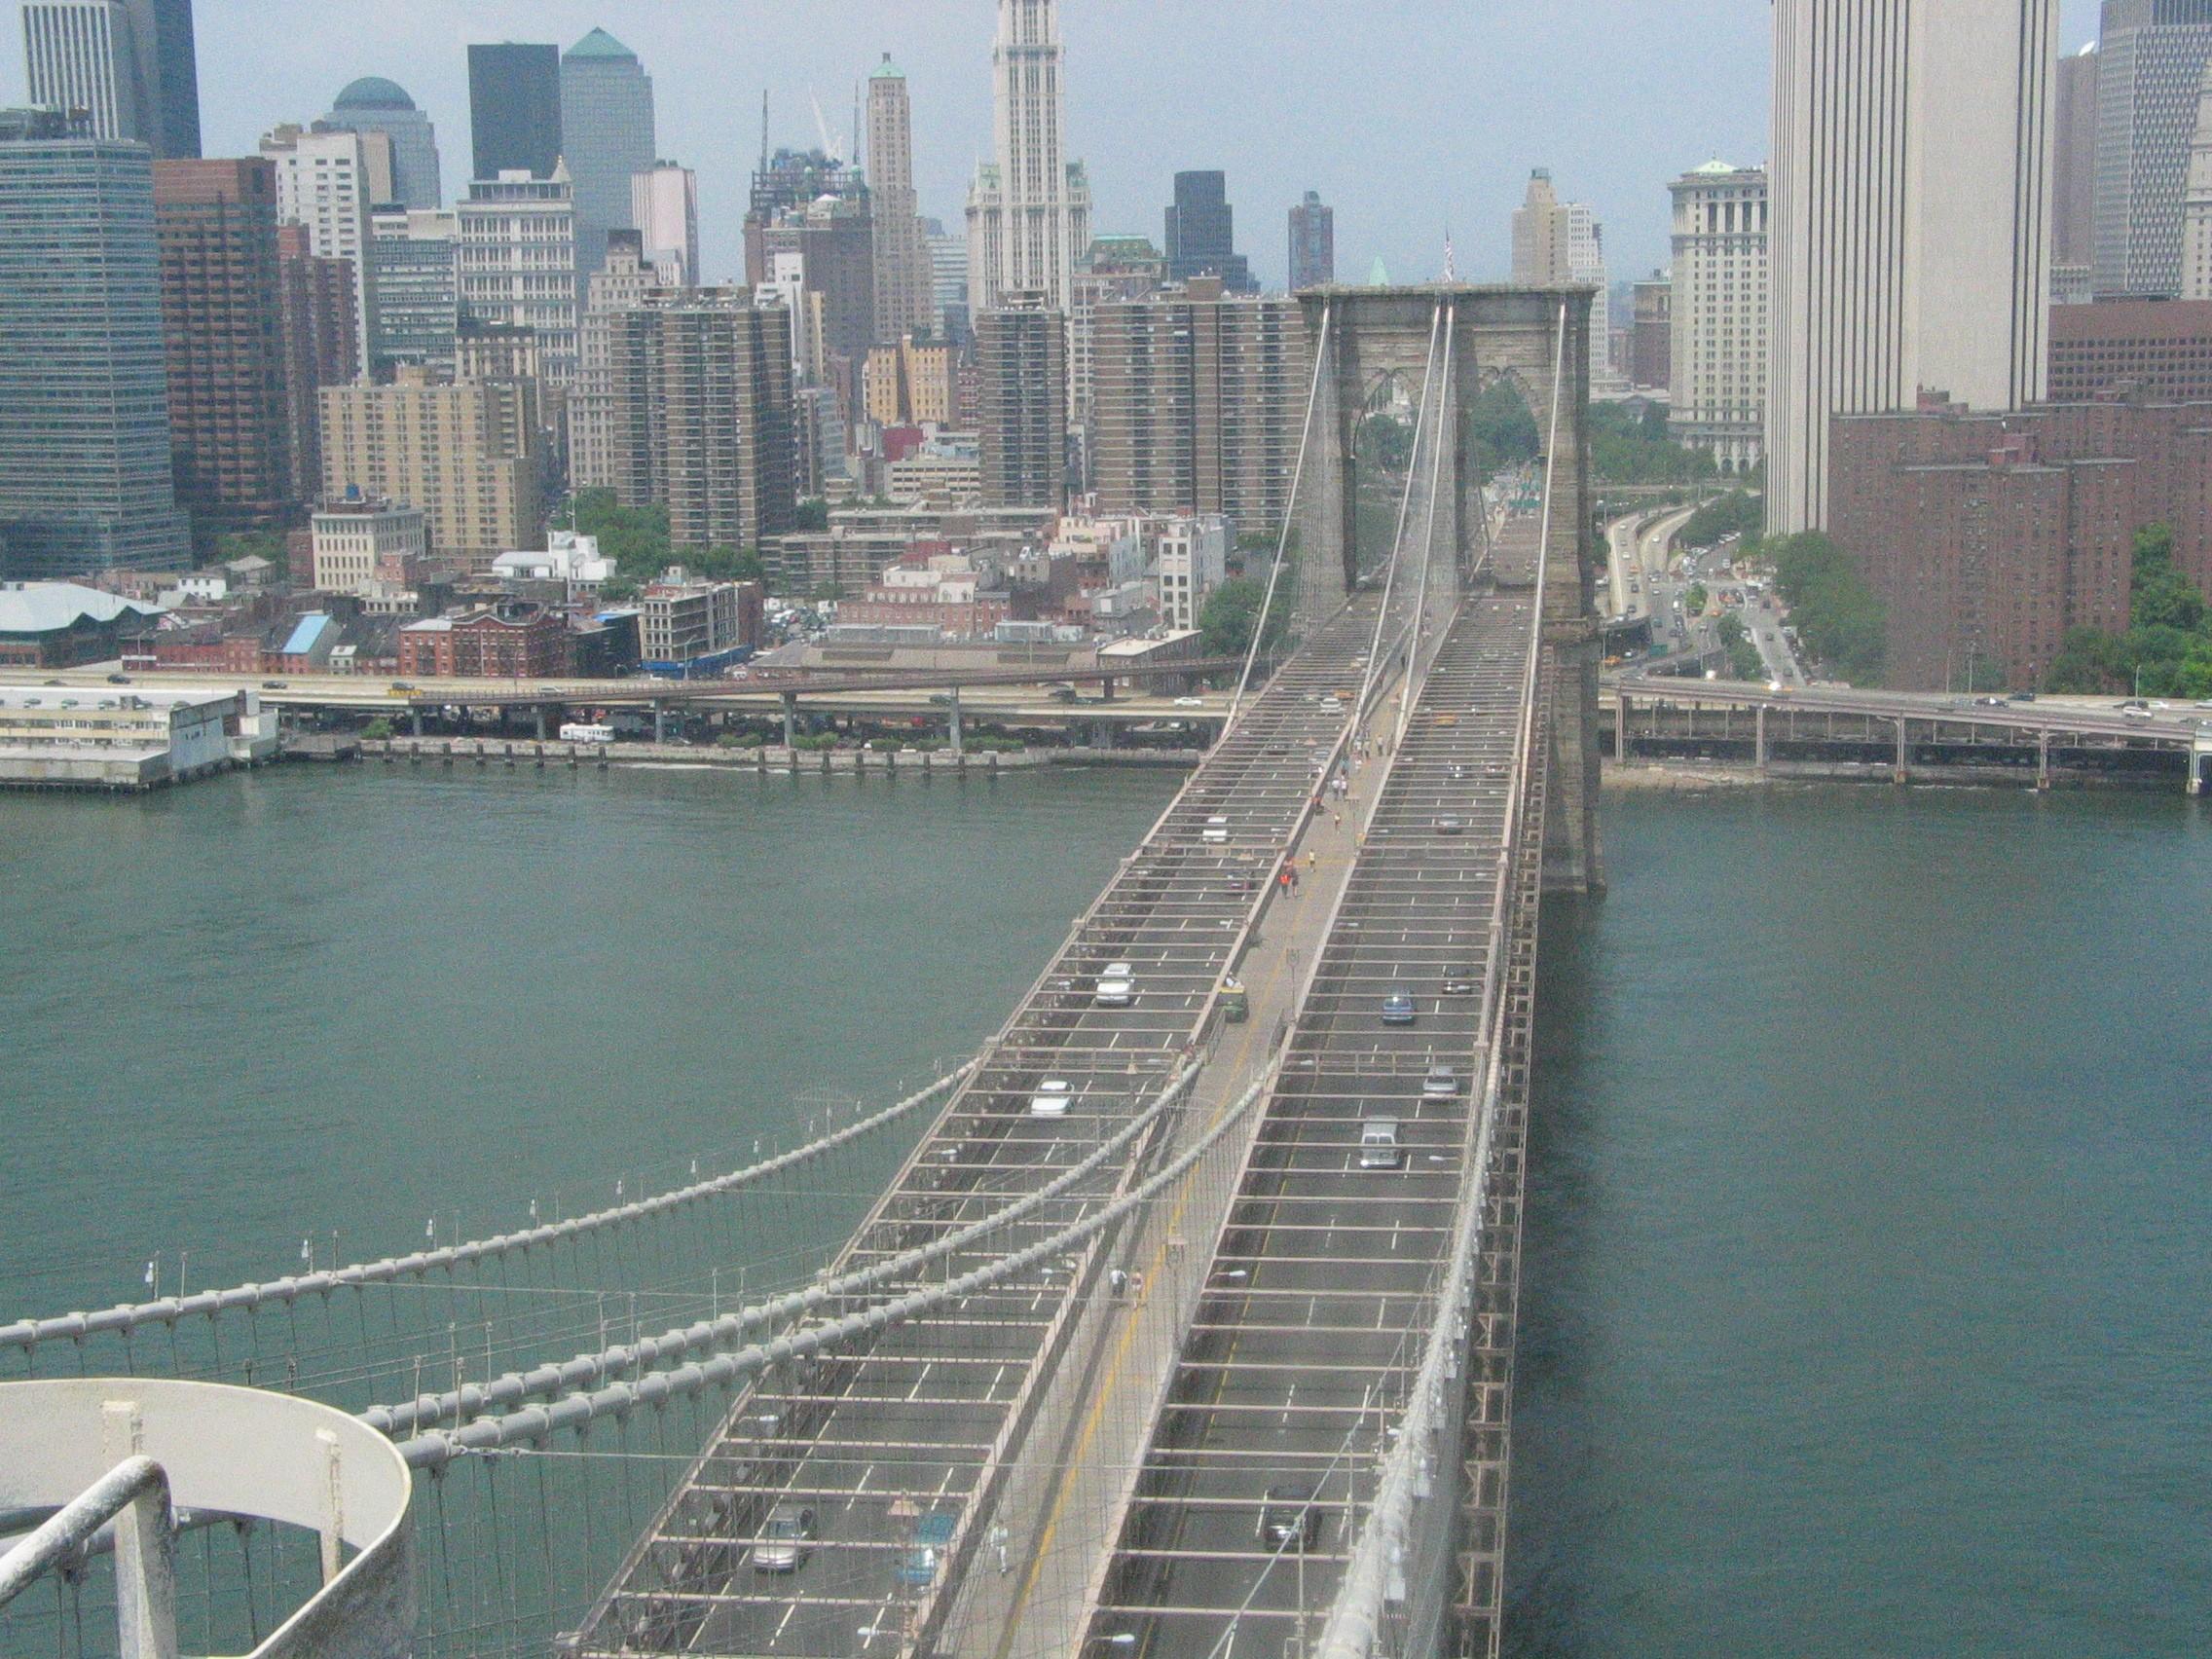 brooklyn bridge from tower